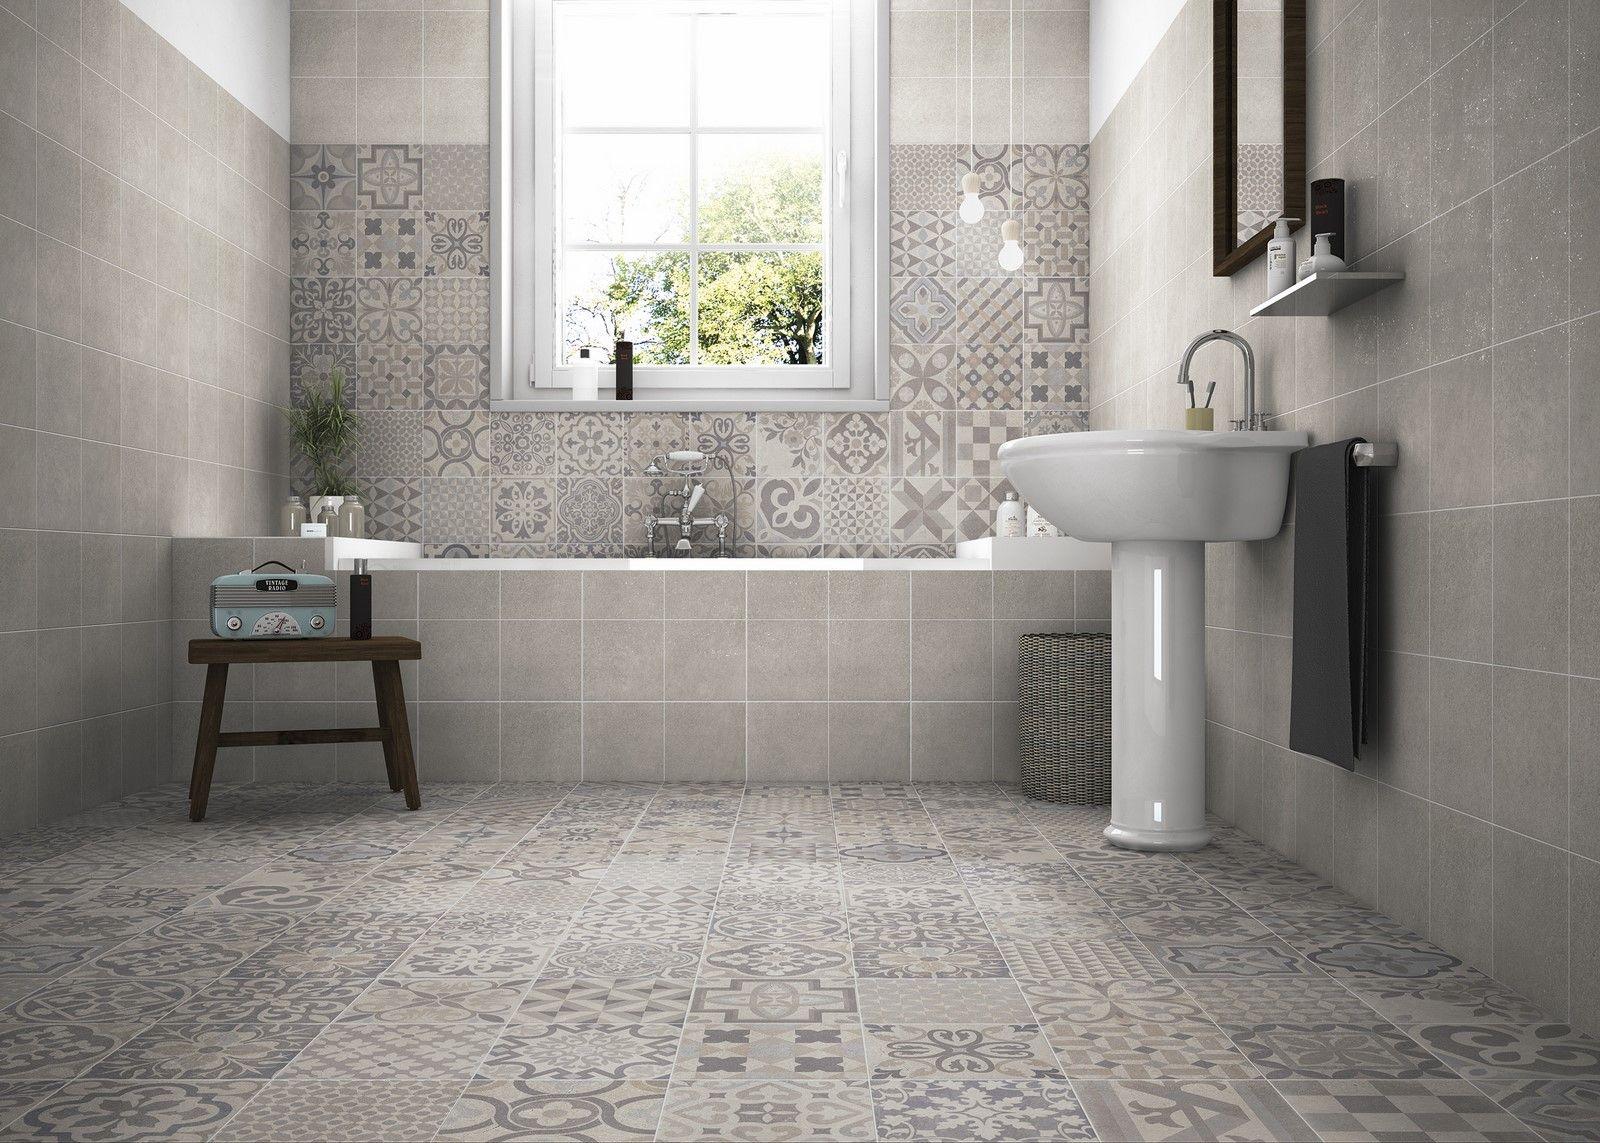 Skyros delft grey wall and floor tile delft wall tiles and walls skyros delft grey wall and floor tile dailygadgetfo Choice Image